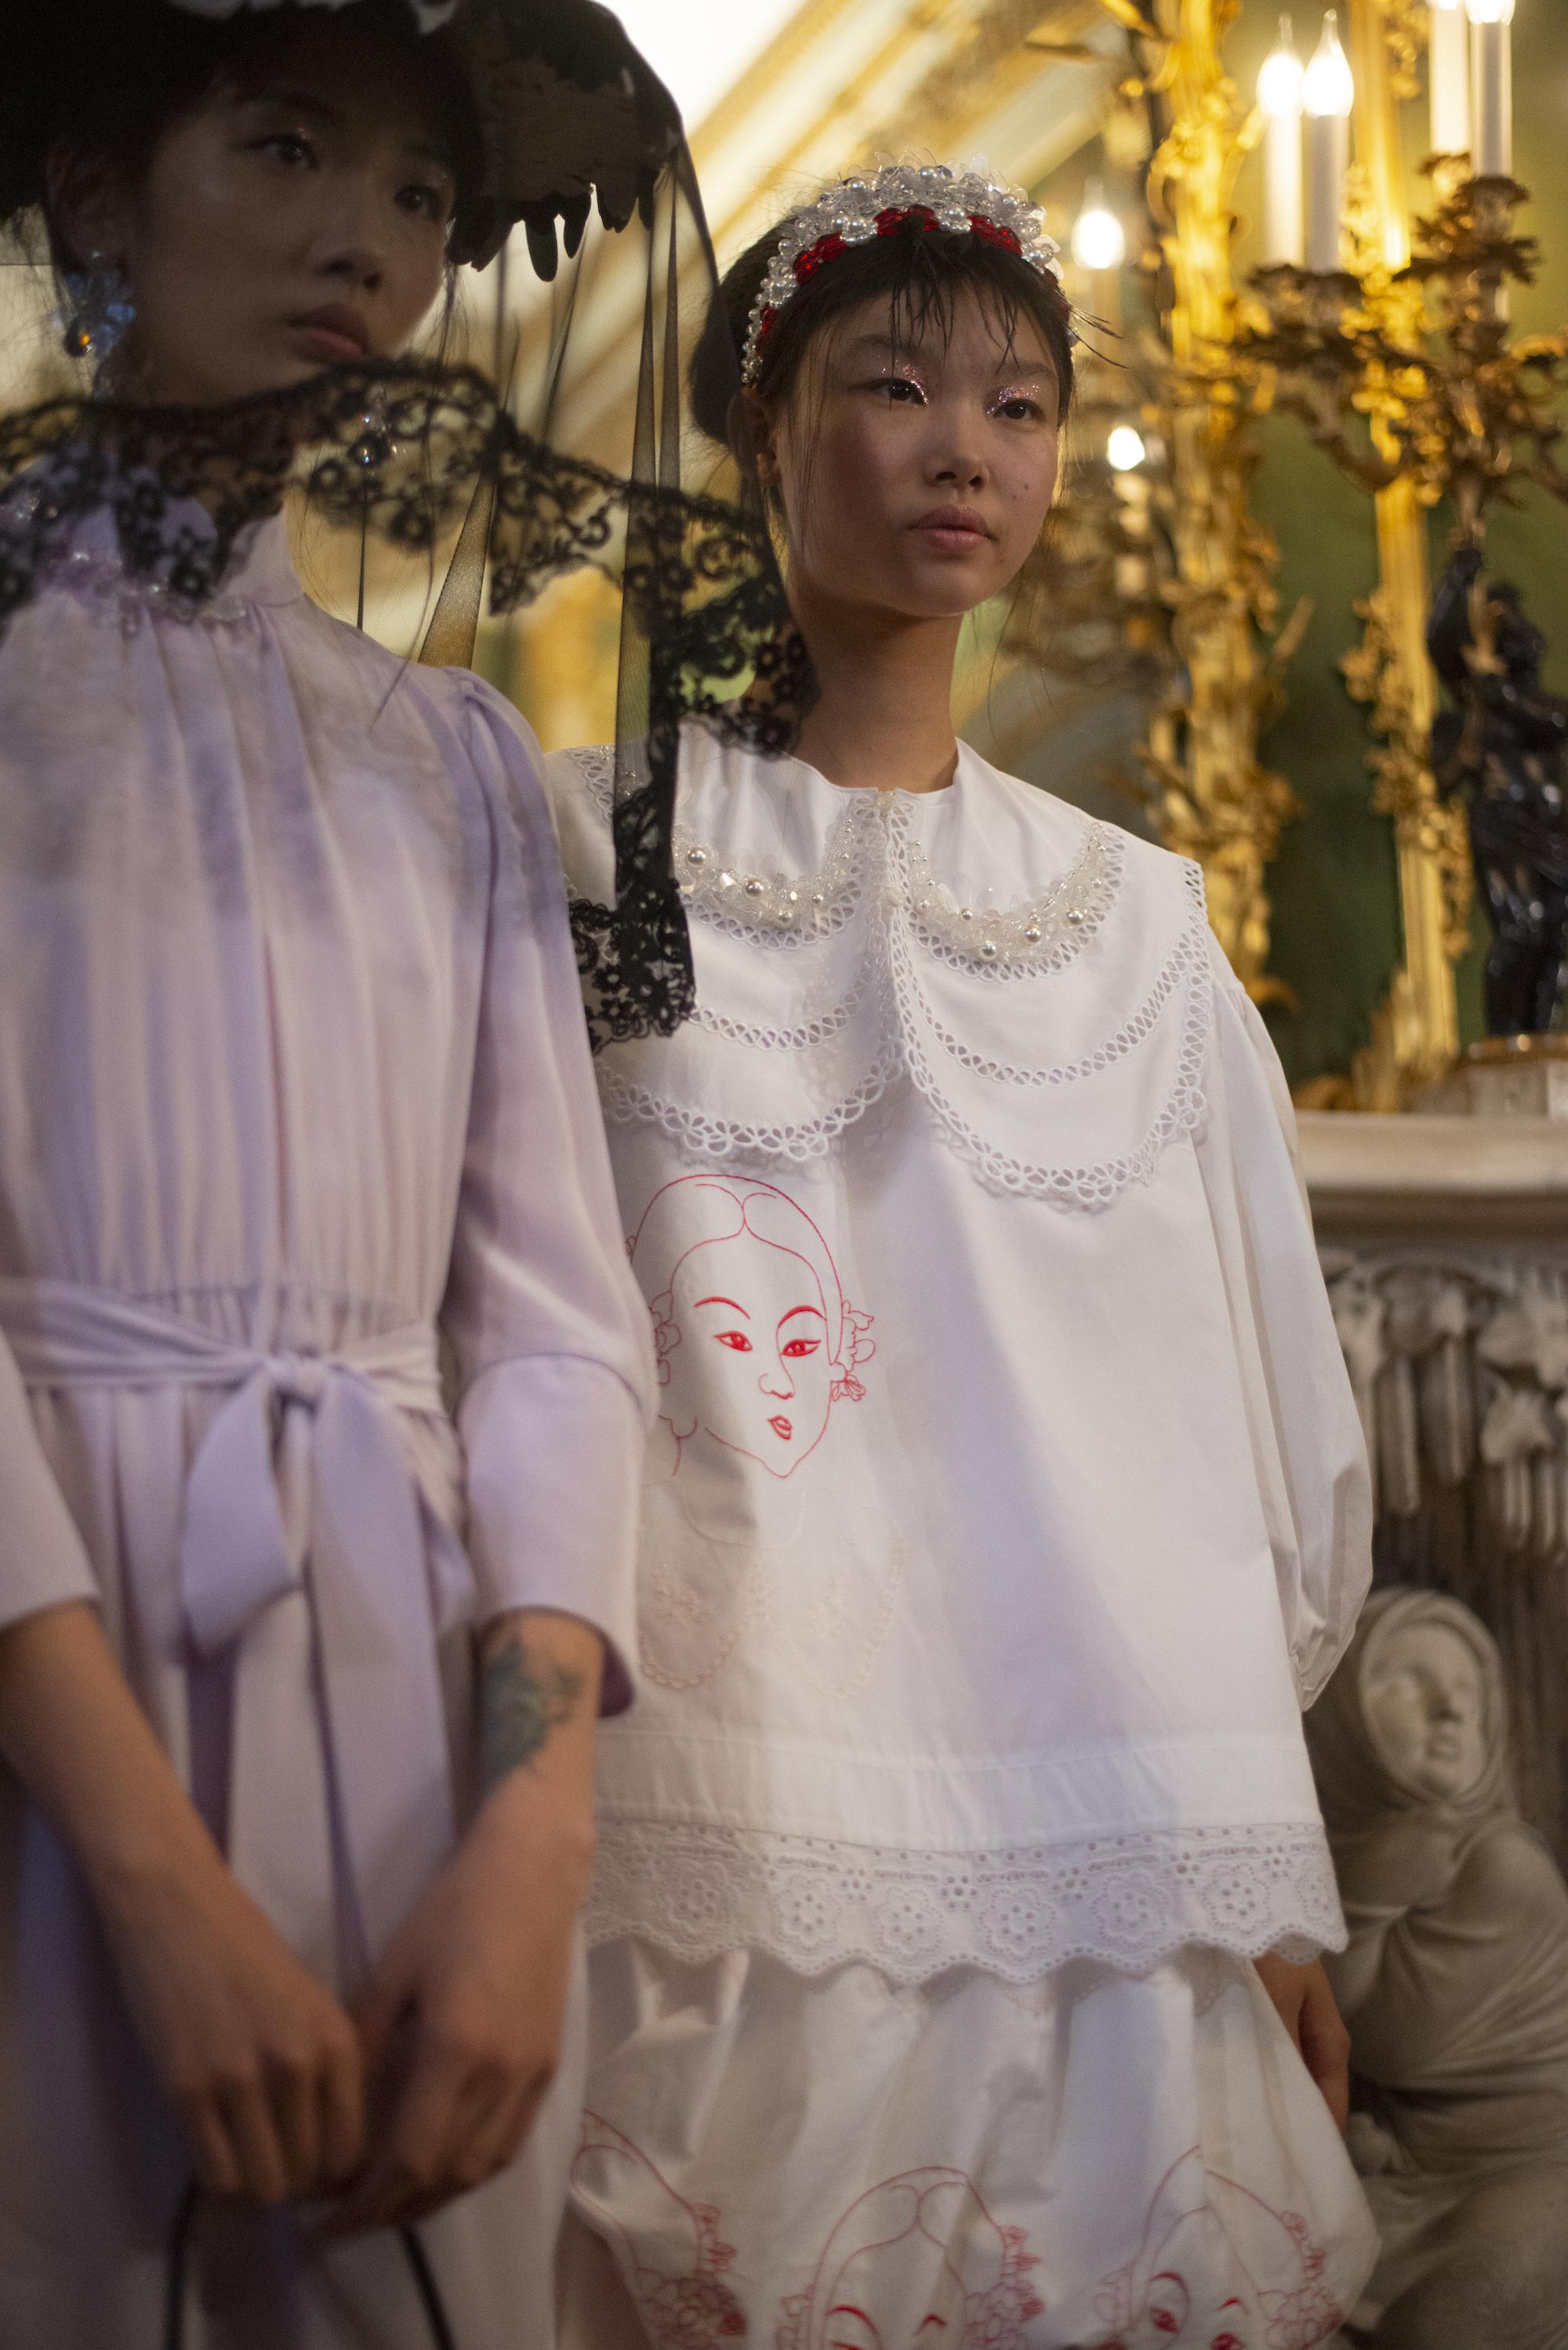 Simone Rocha S Spring Summer 19 London Fashion Week 2018 Show Personal Playful Femininity At London Fashion Week I D